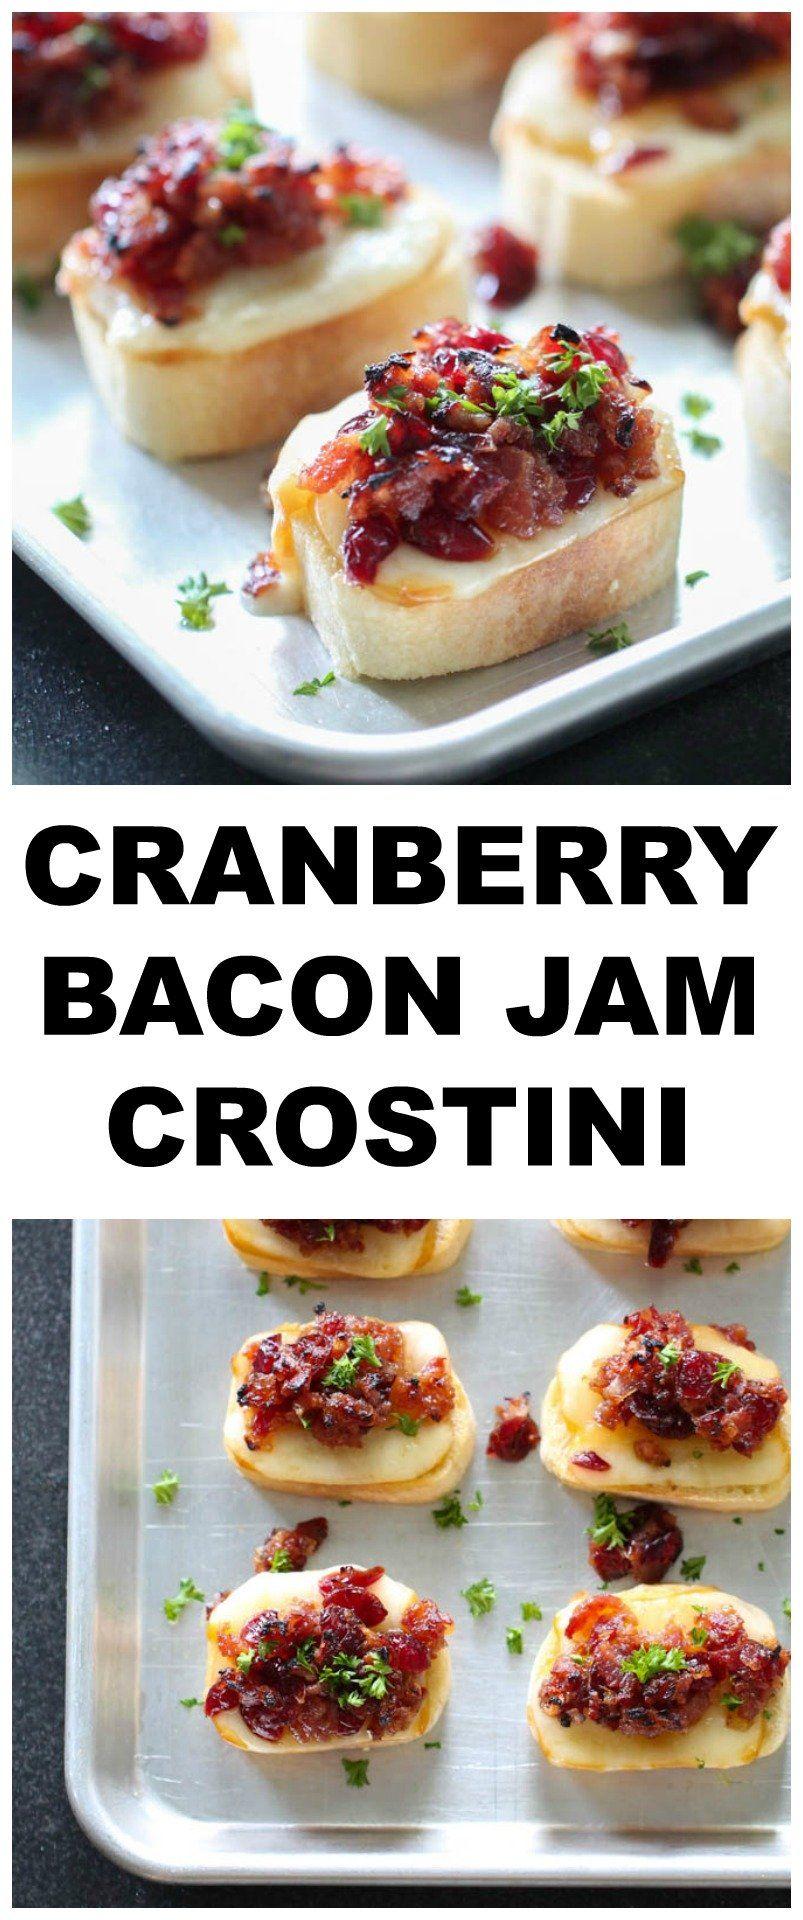 Cranberry Bacon Jam Crostini Recipe   Six Sisters' Stuff